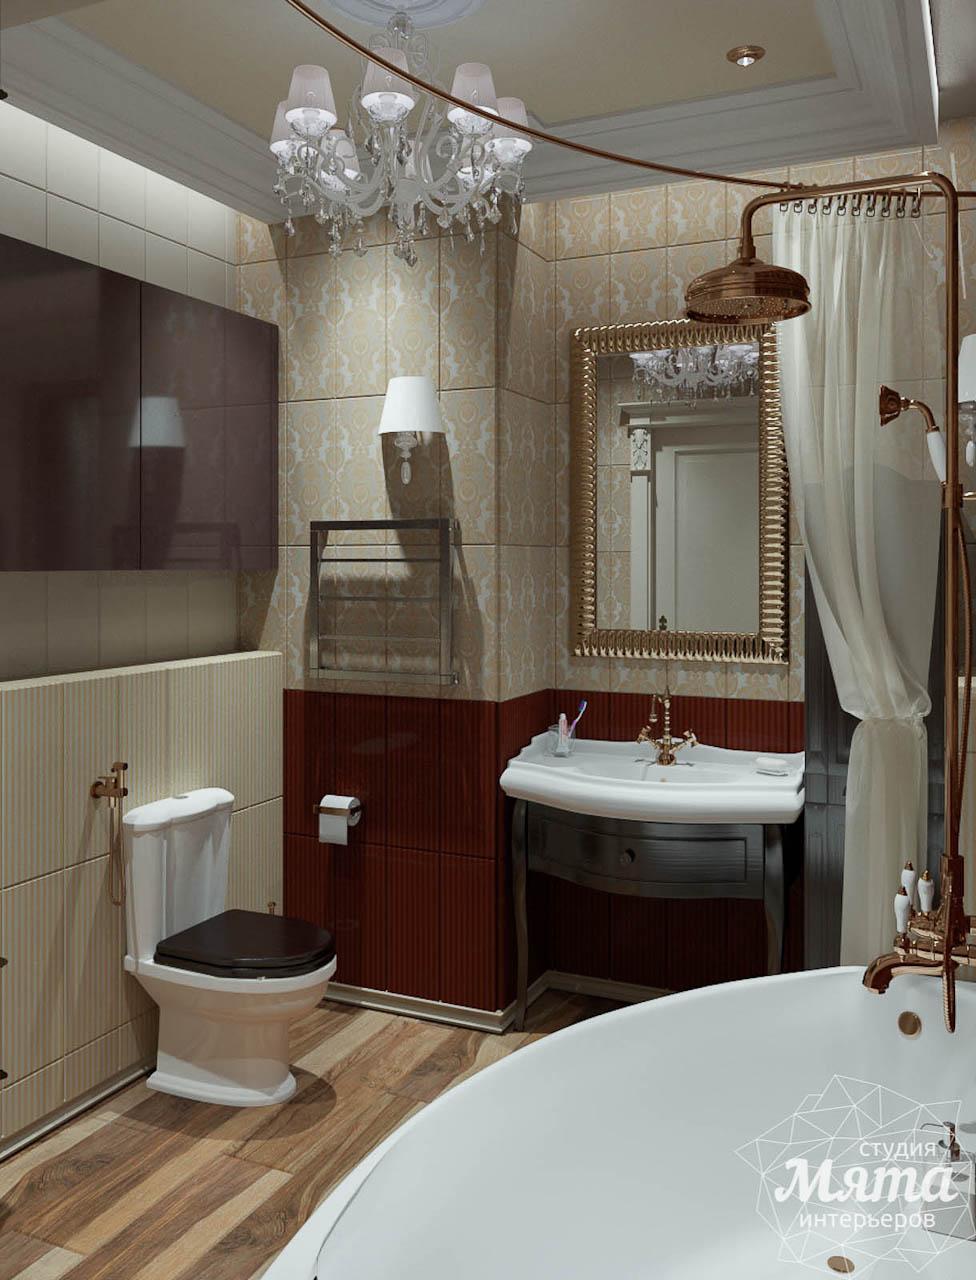 Дизайн интерьера и ремонт трехкомнатной квартиры в Карасьозерском 2 img1058341640